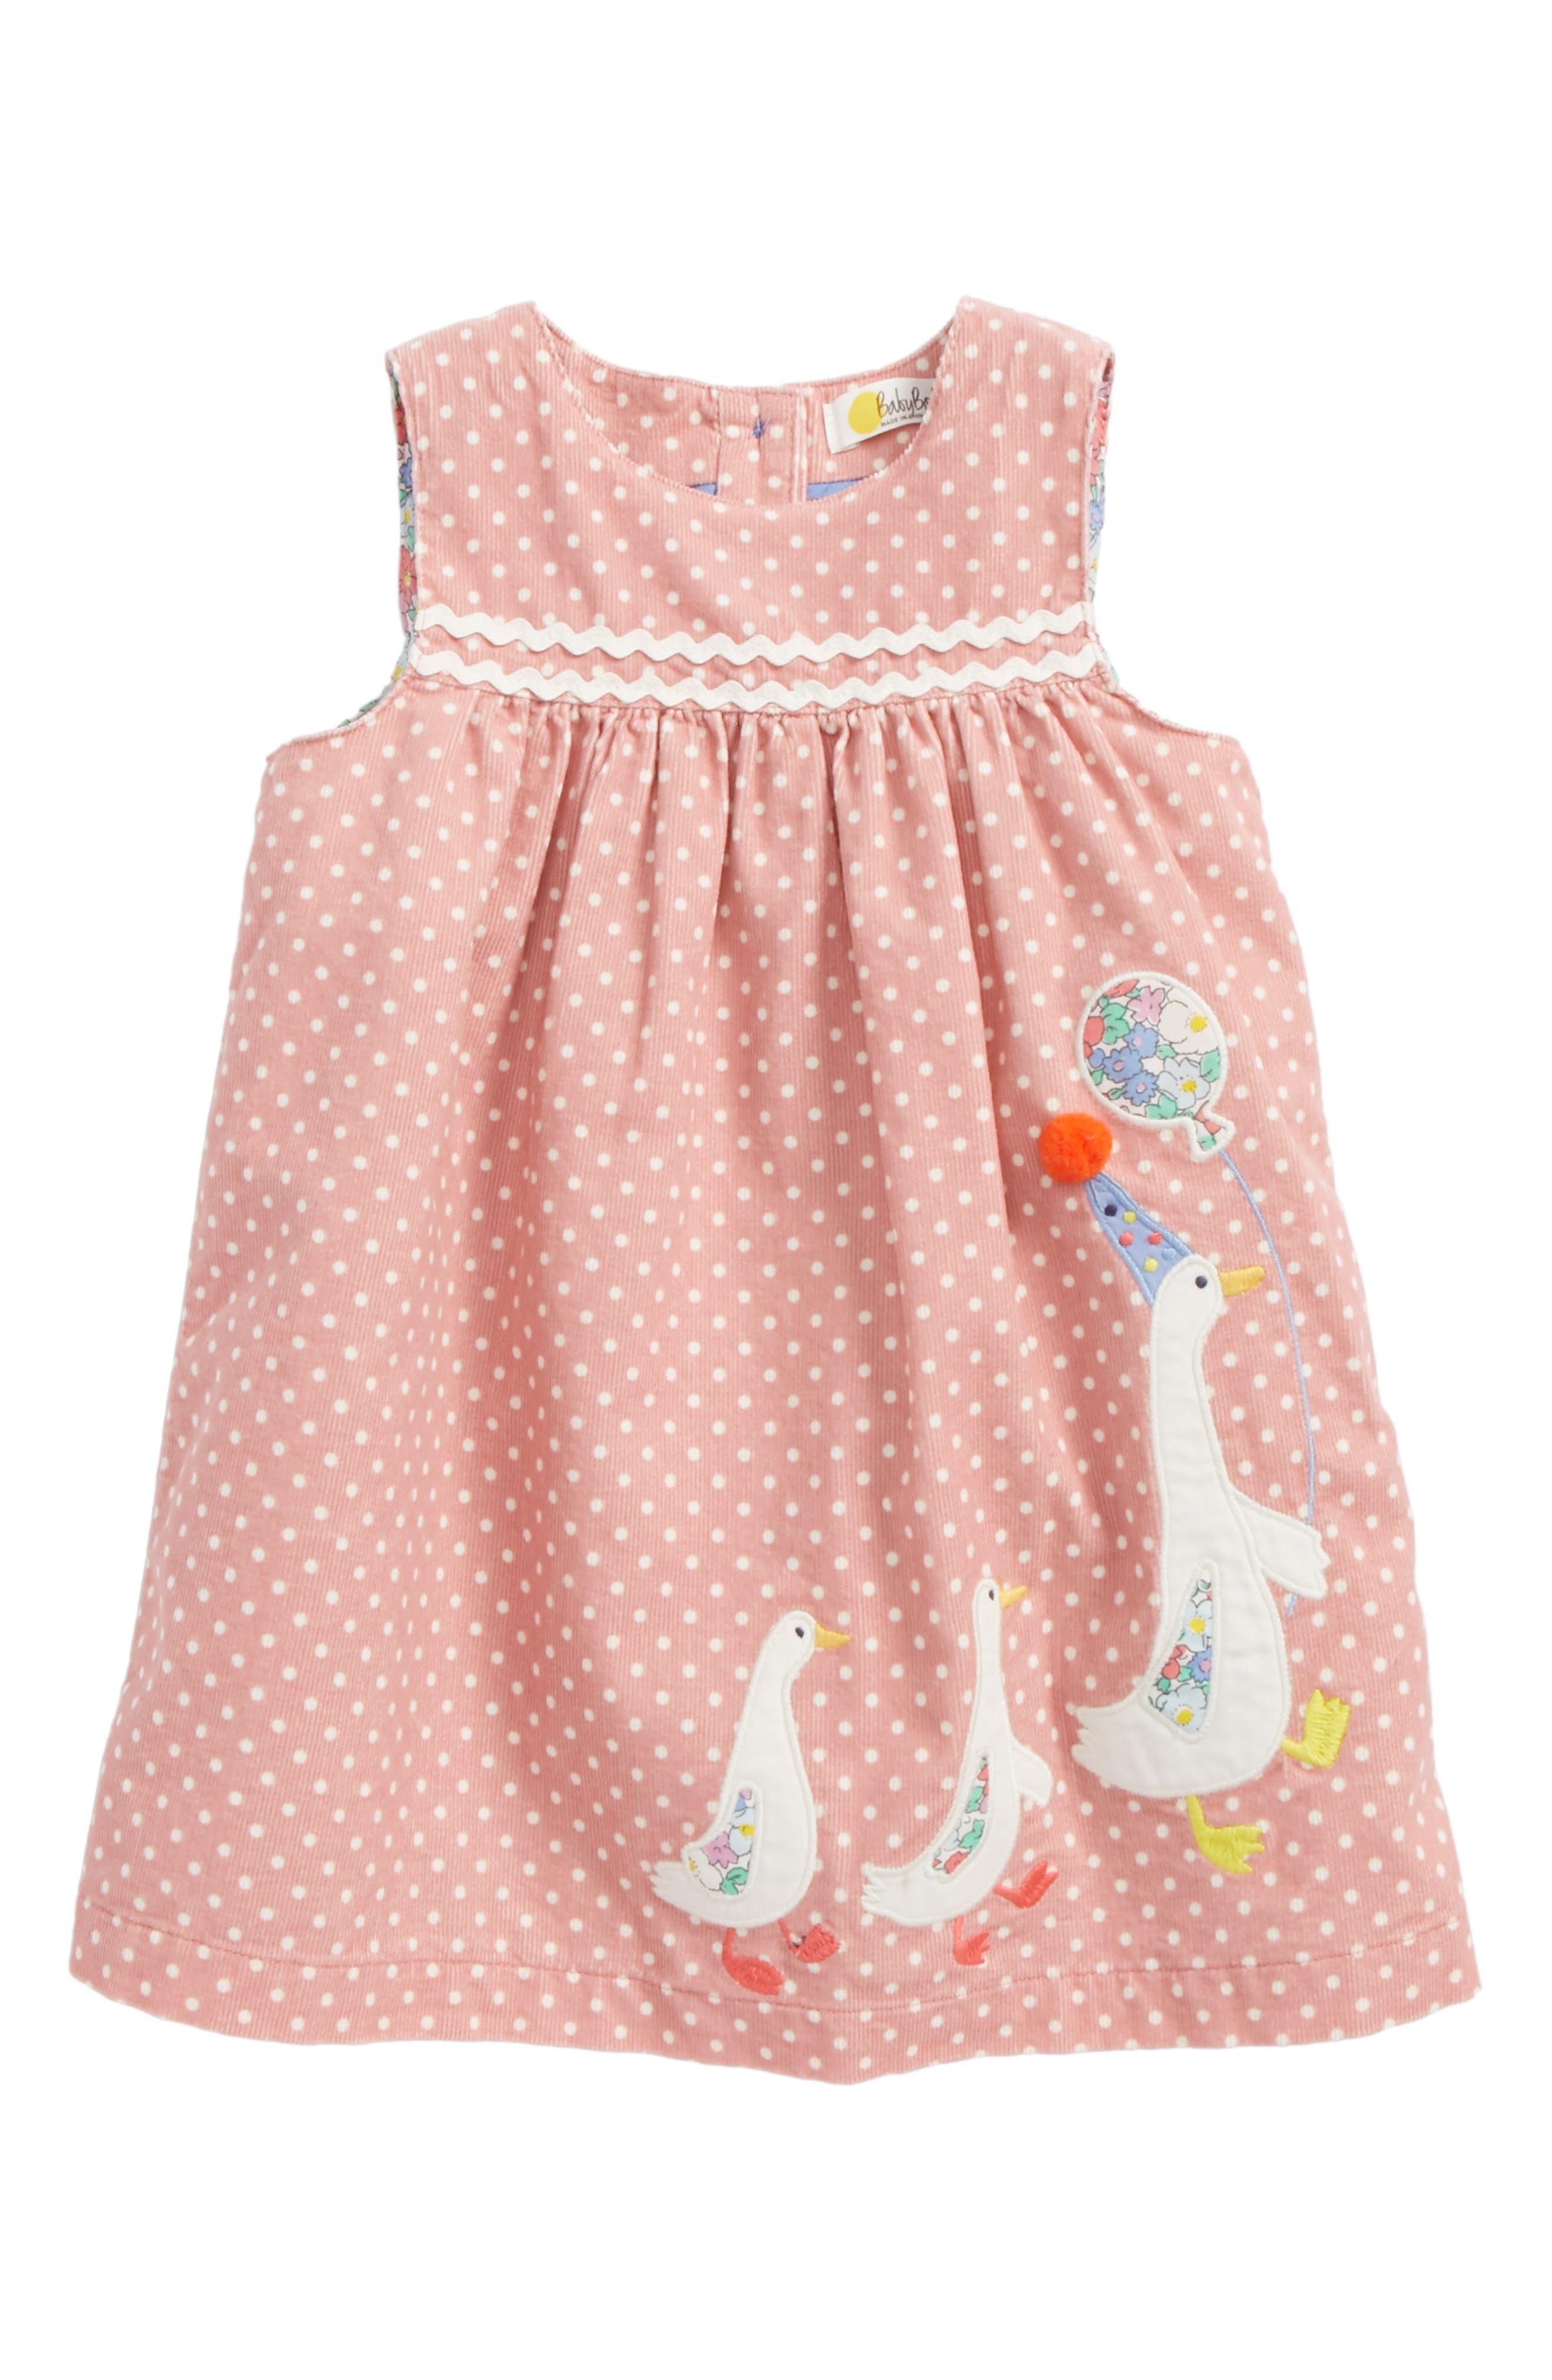 Appliqué Corduroy Pinafore,                         Main,                         color, Blossom Pink